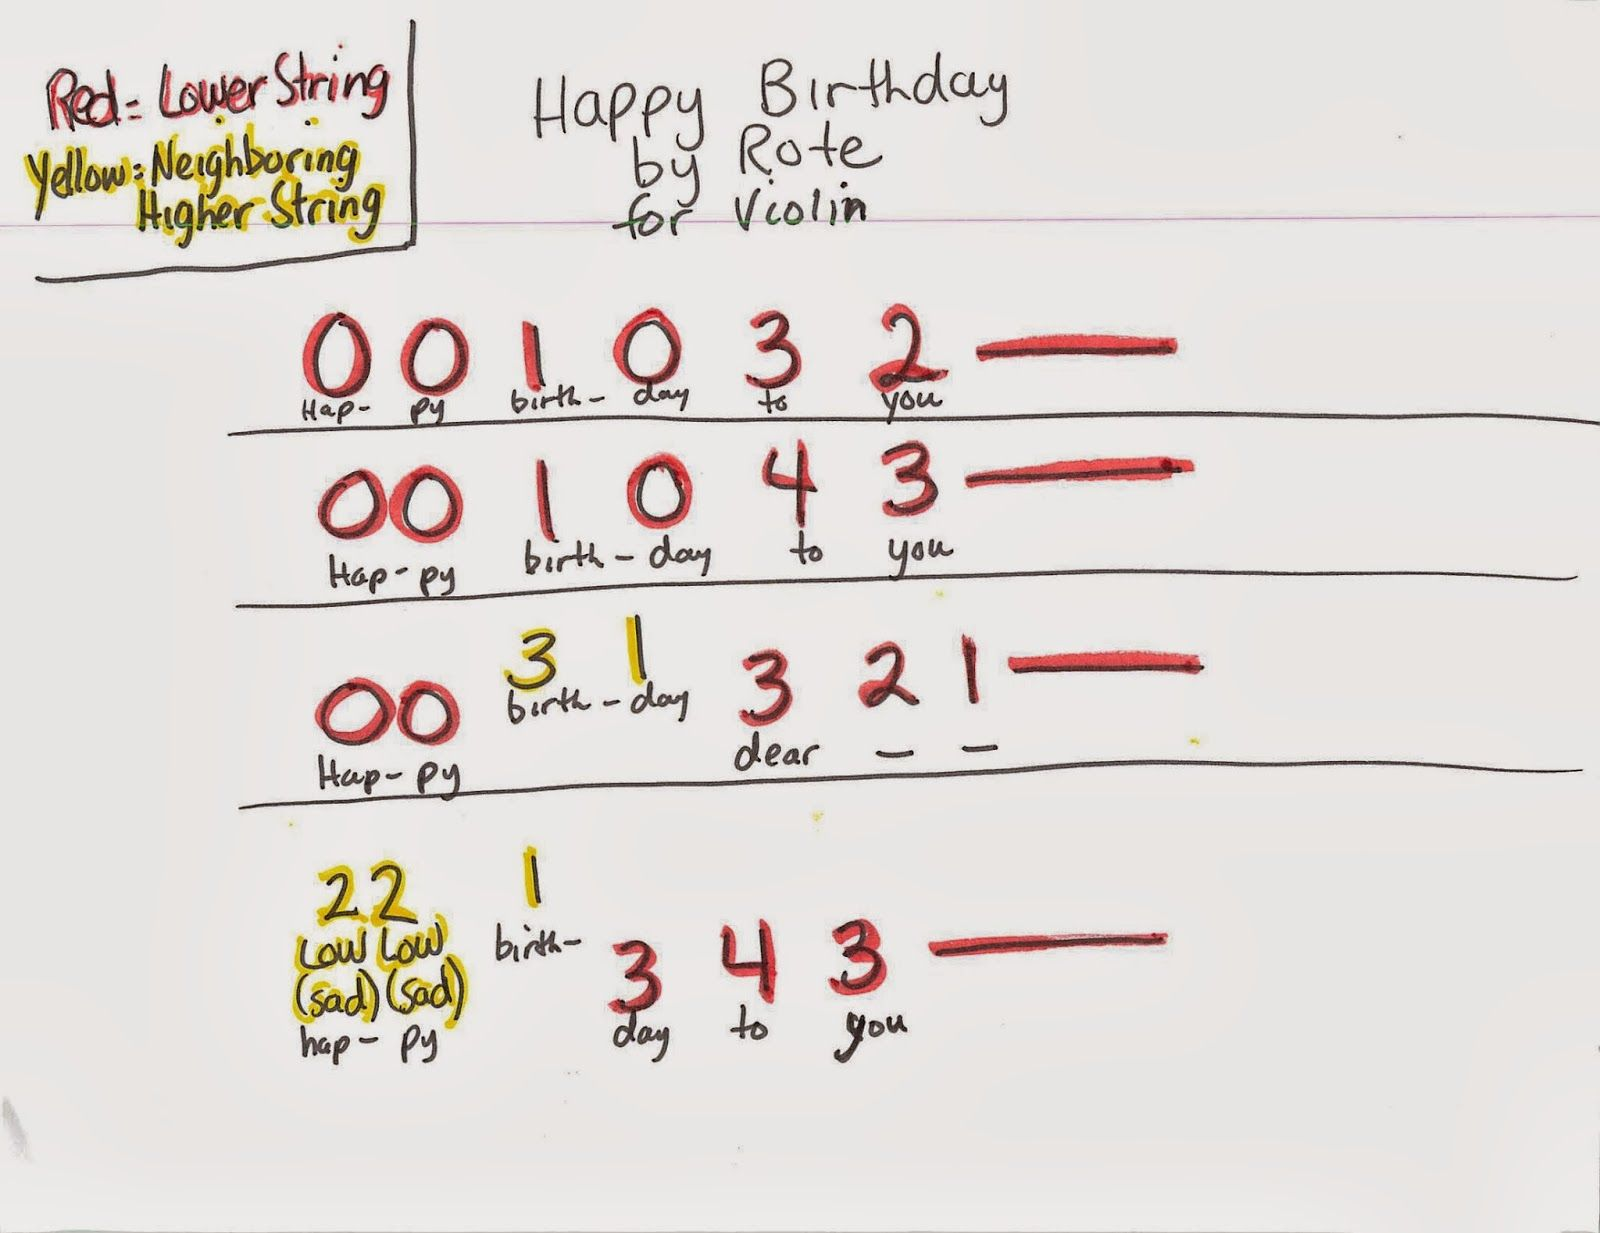 Happy Birthday Music Notes Violin Beginning Violin Happy